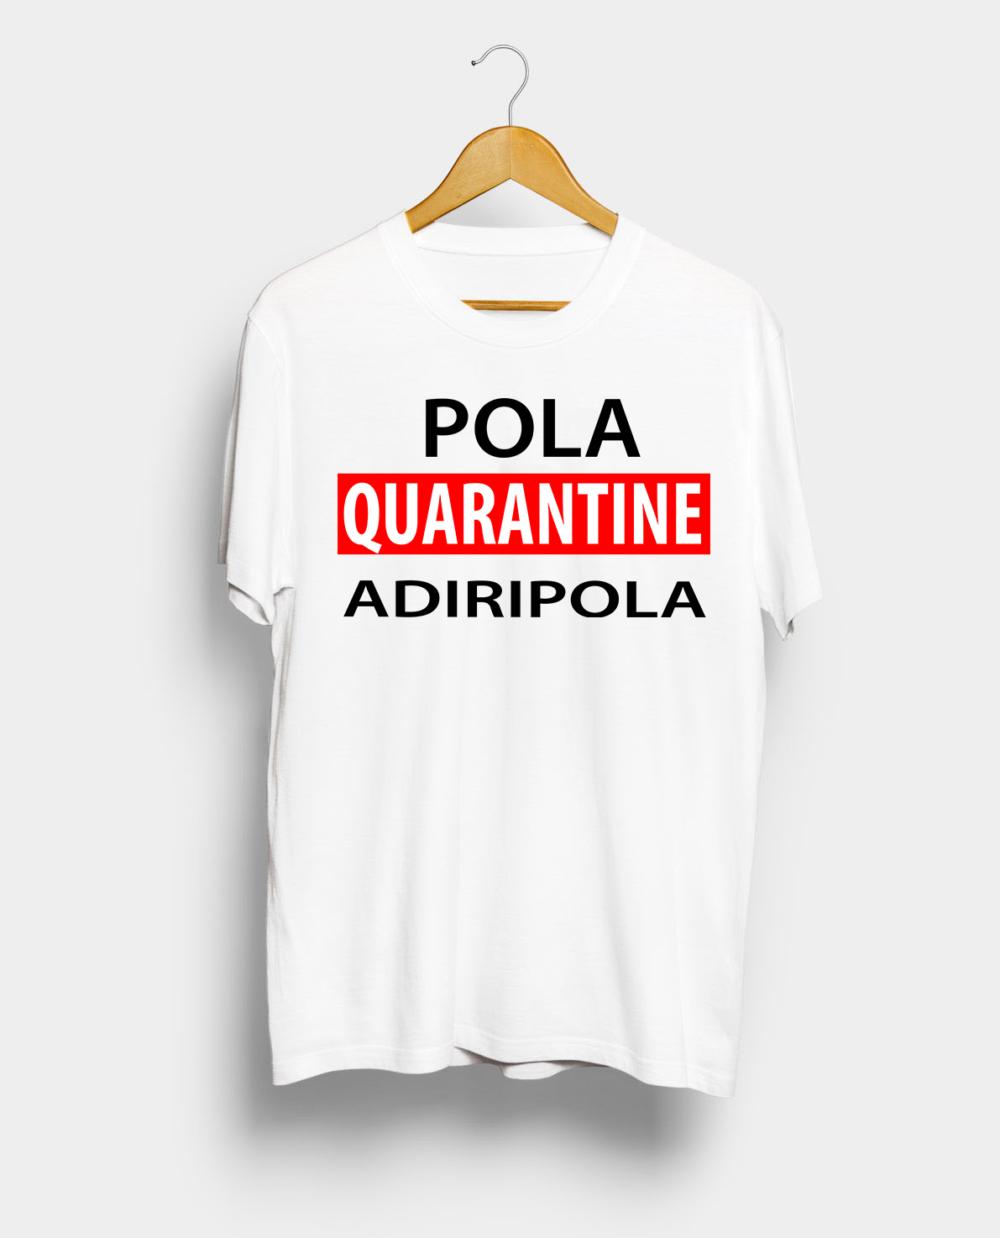 Telugu Trending Pola Quarantine Adiripola Graphic Printed T shirt